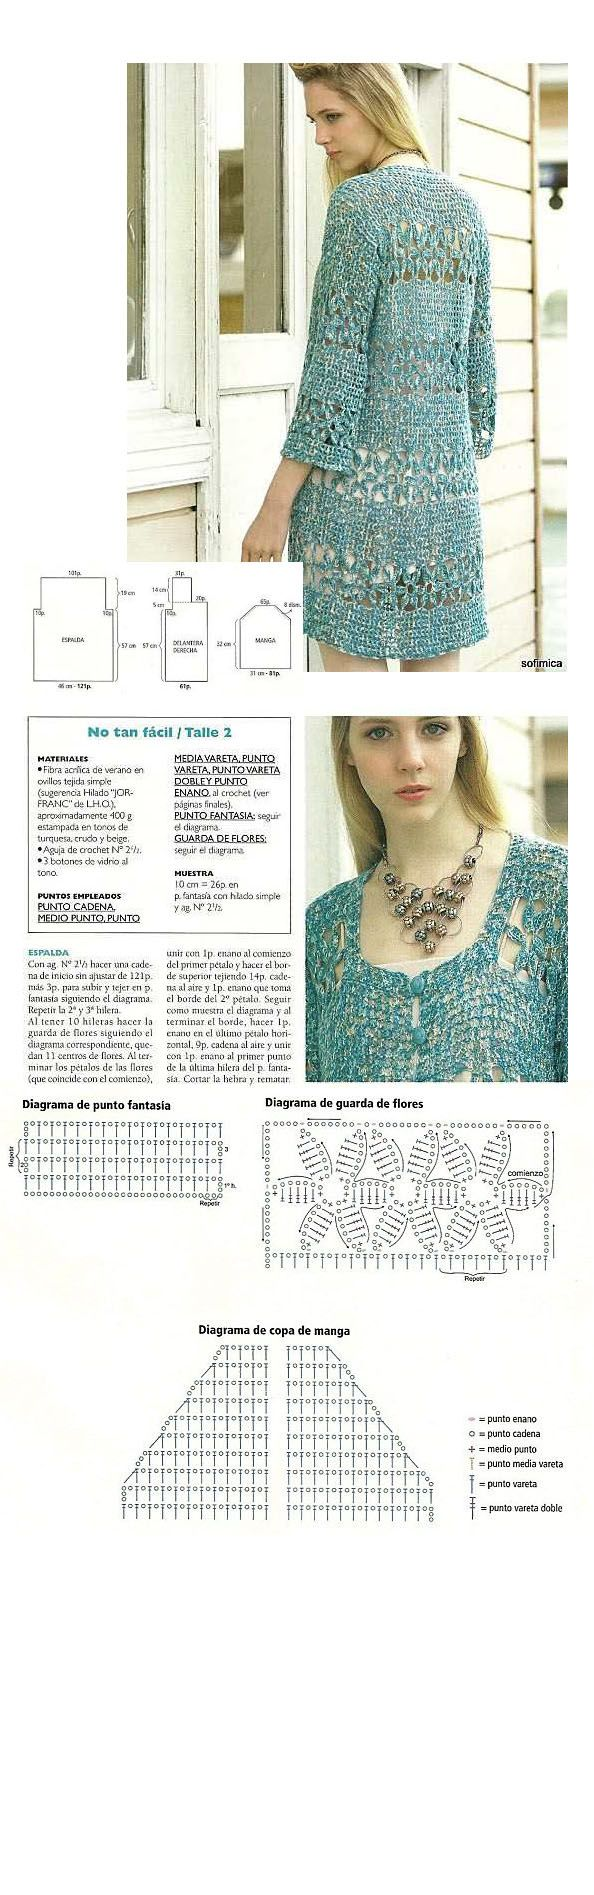 molde 1 | CROCHET | Pinterest | Suéteres largos, Chaleco crochet y ...